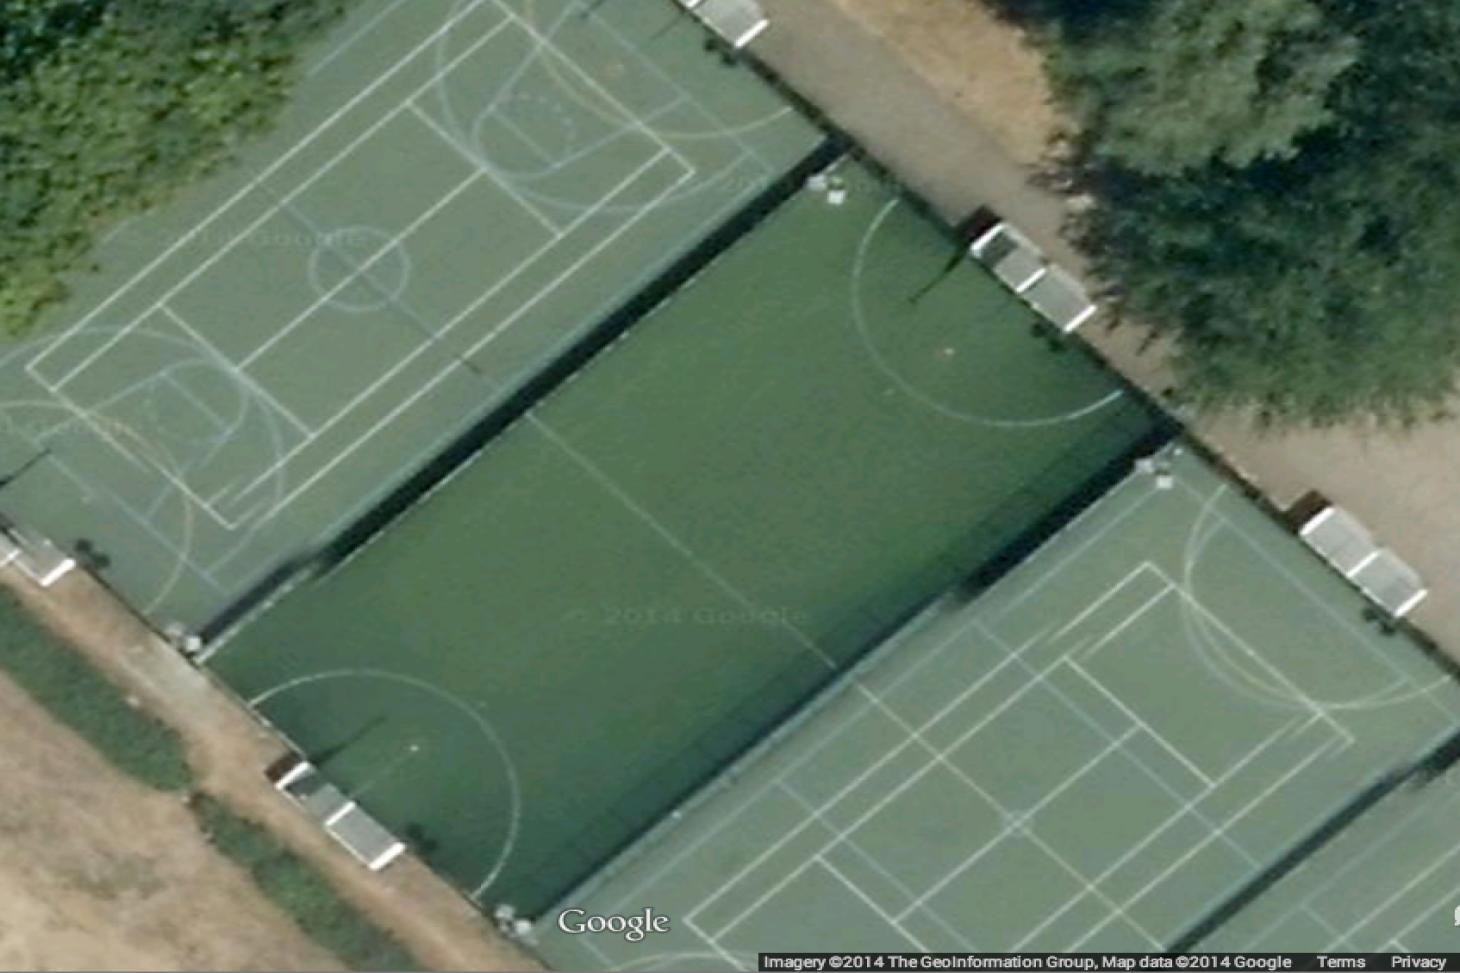 Elthorne Sports Centre 5 a side | Concrete football pitch